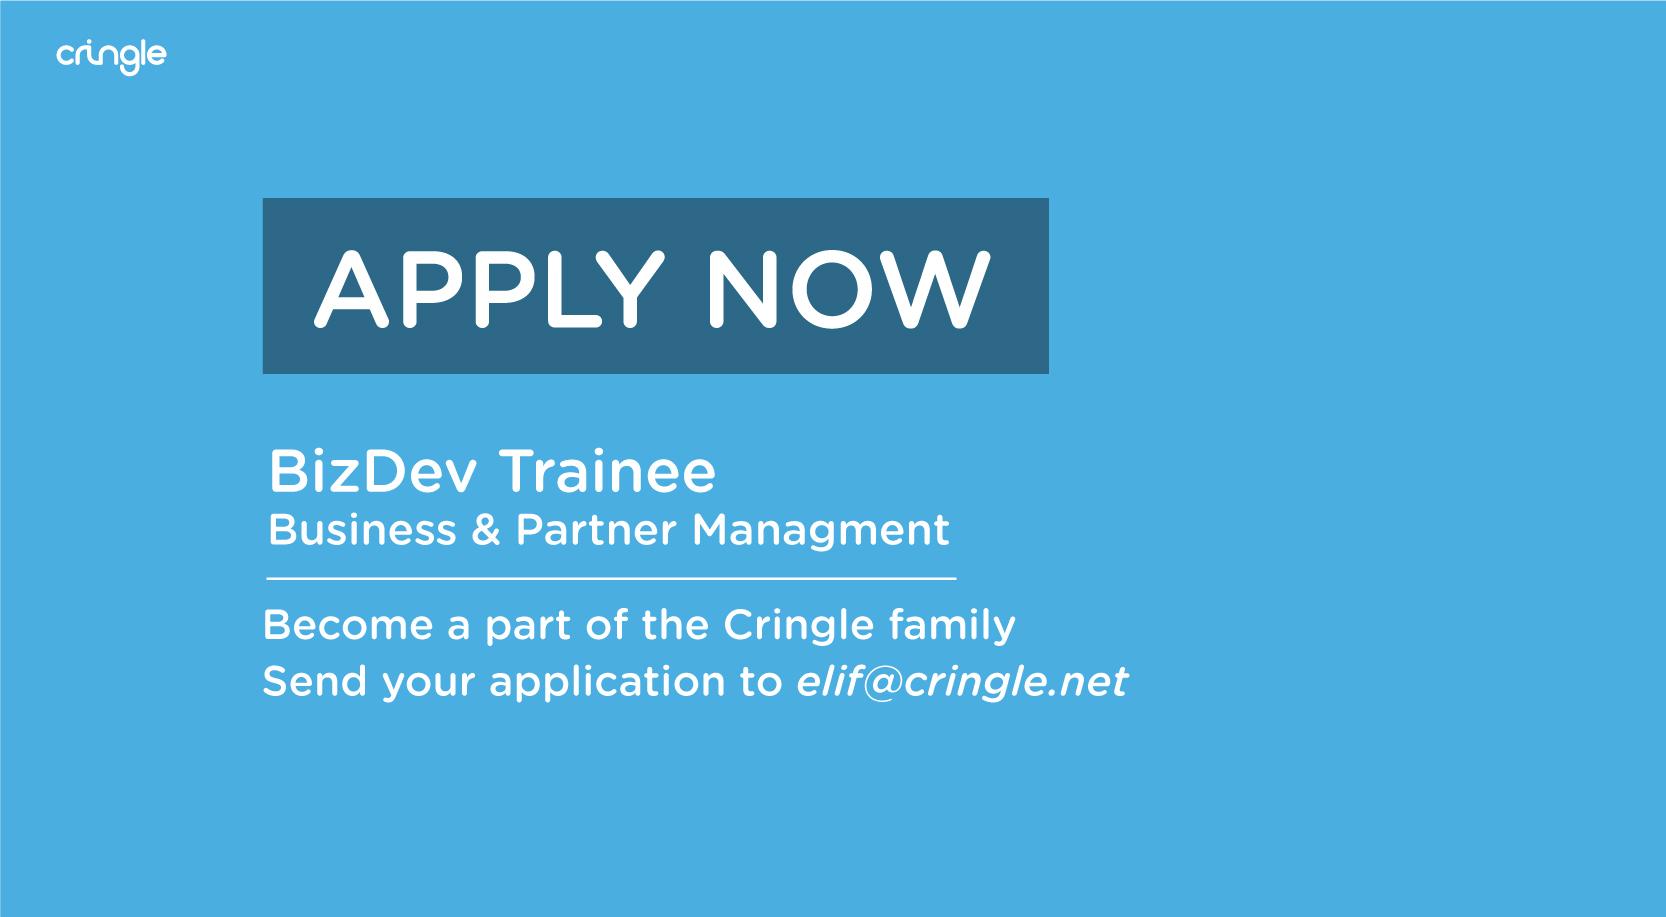 Cringle - Apply now